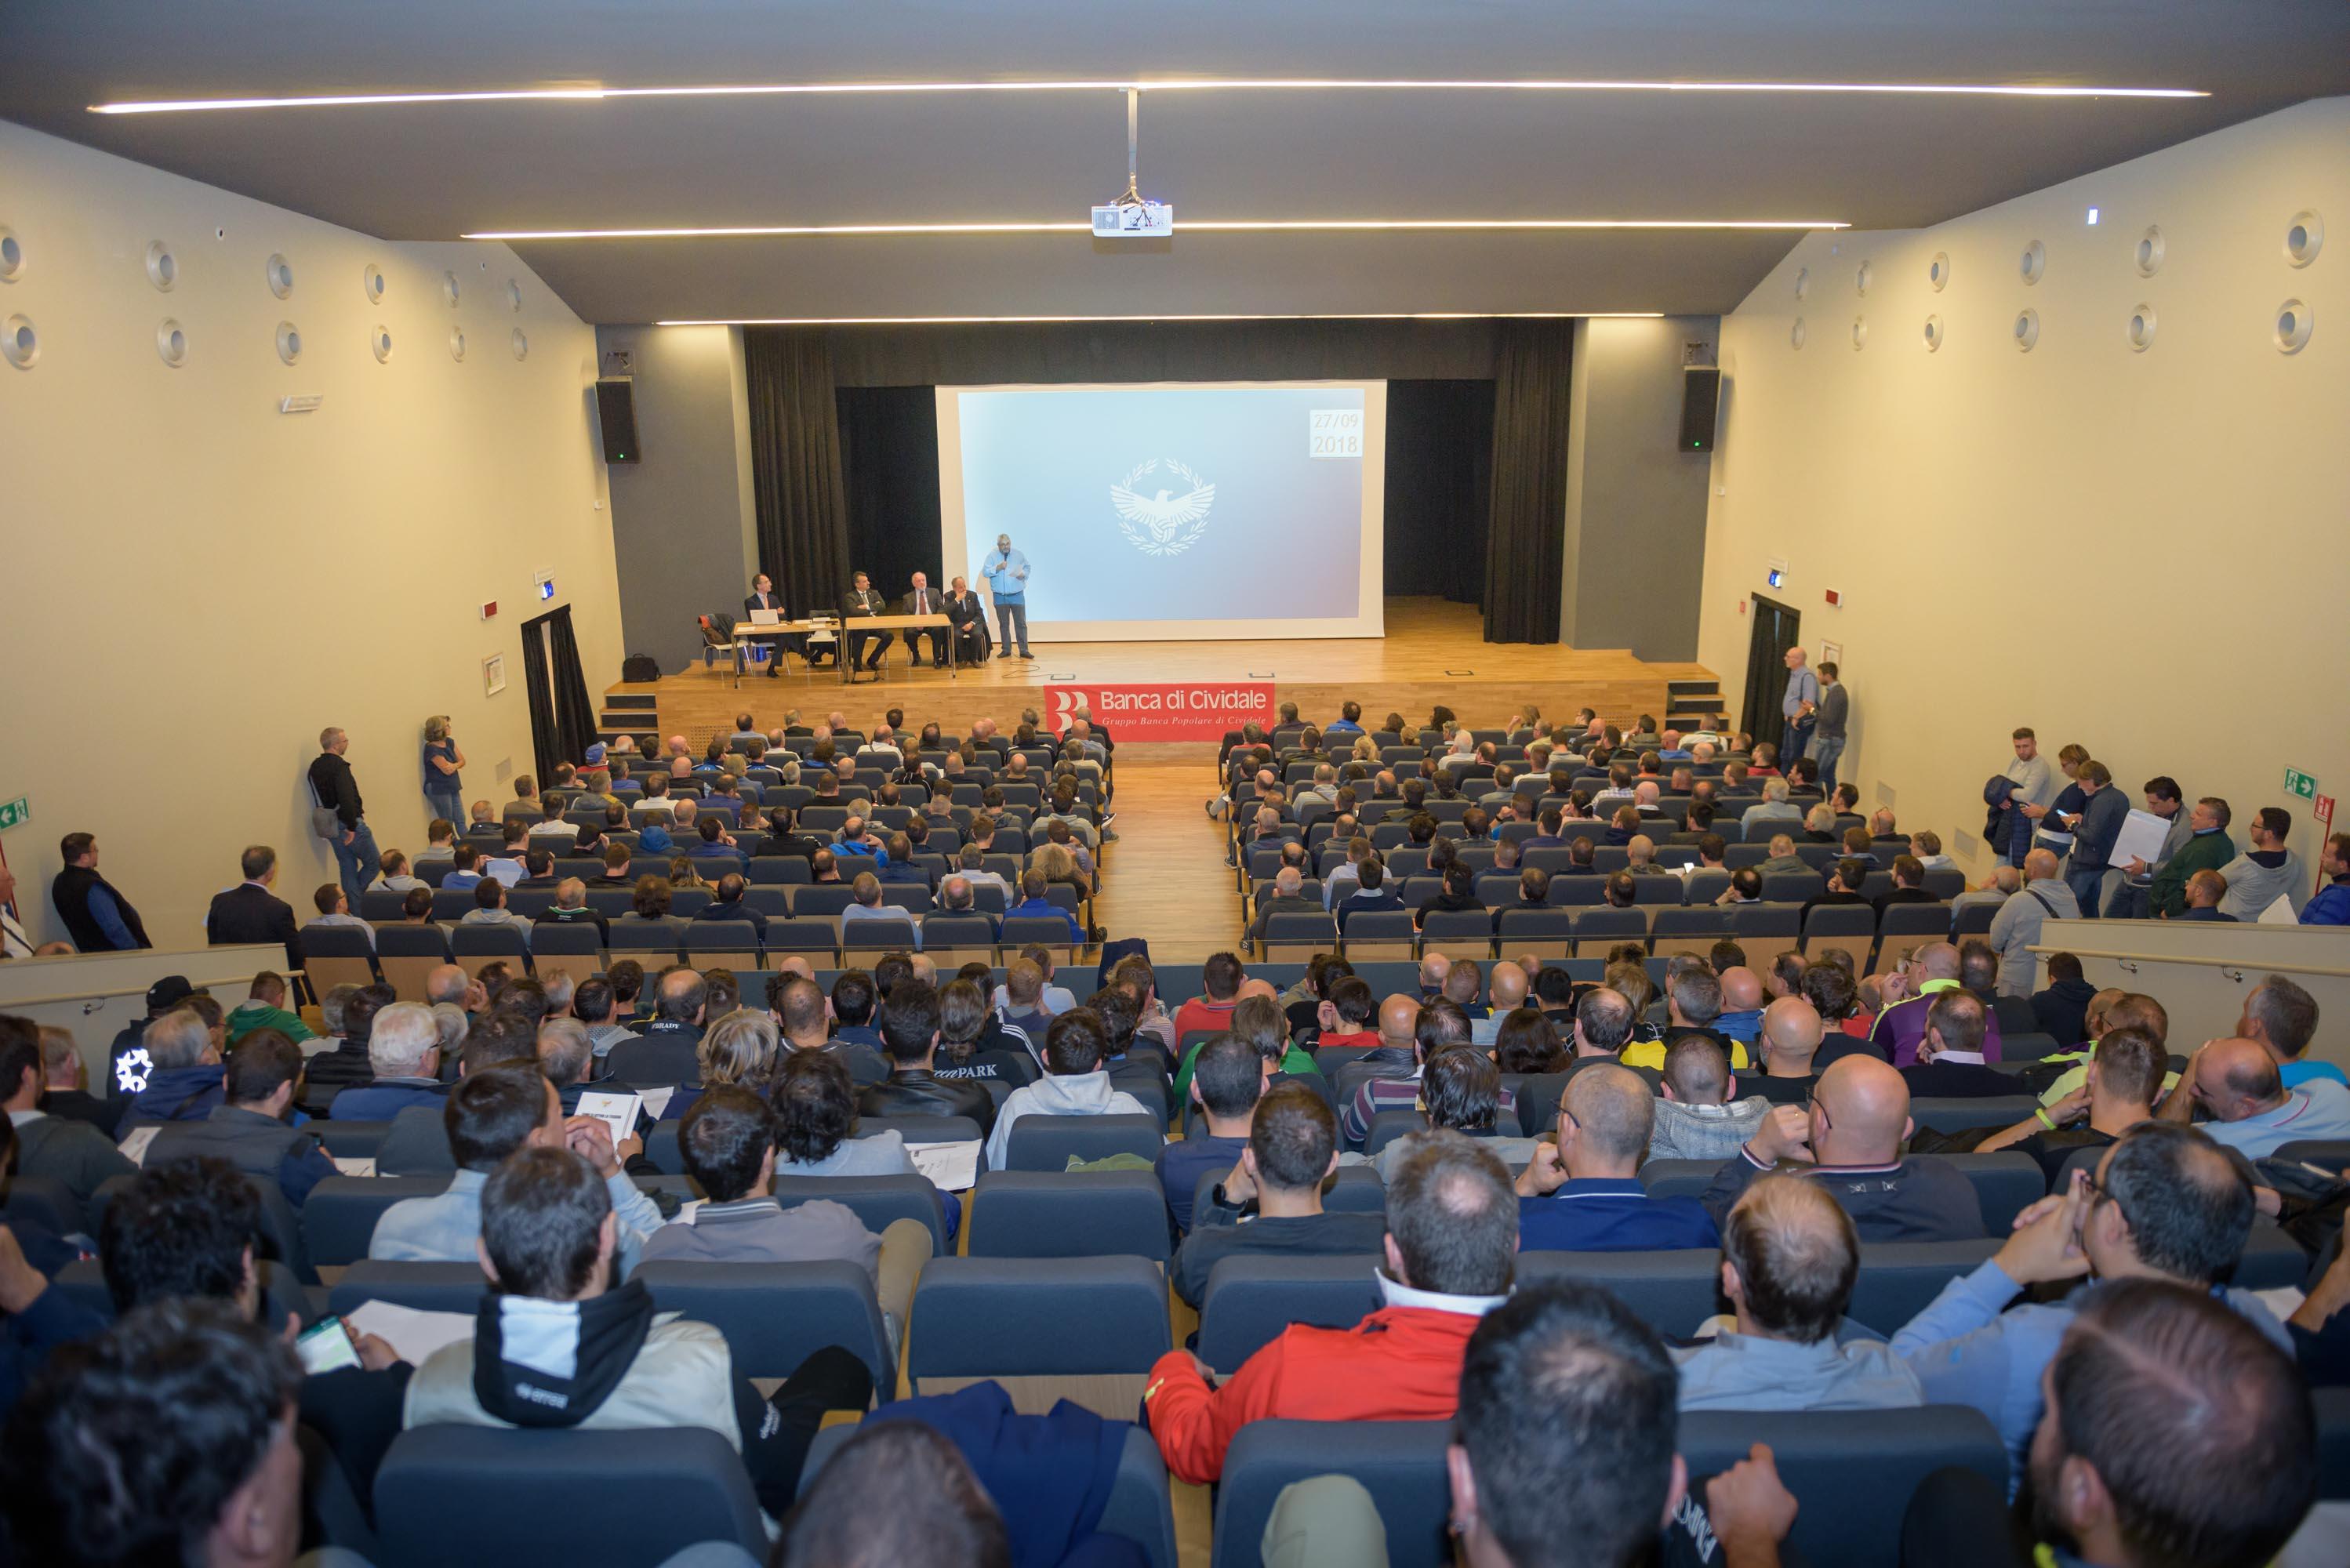 Assemblee, riunioni, questionari e Coppa Amatori